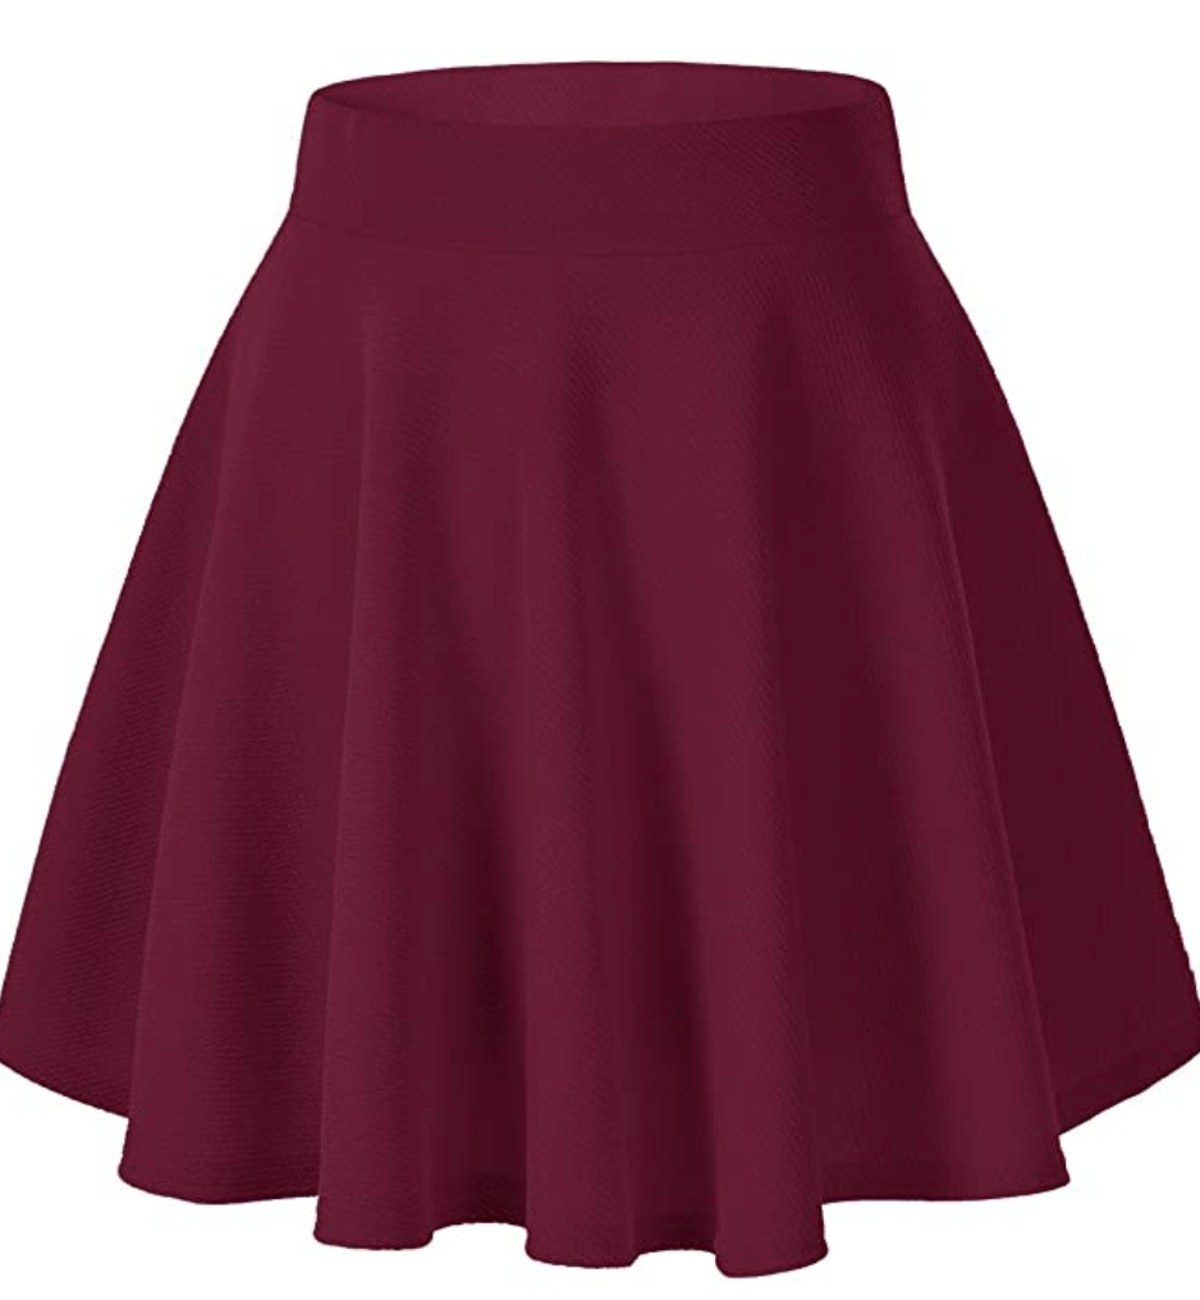 Urban CoCo Wine Red Skater Skirt